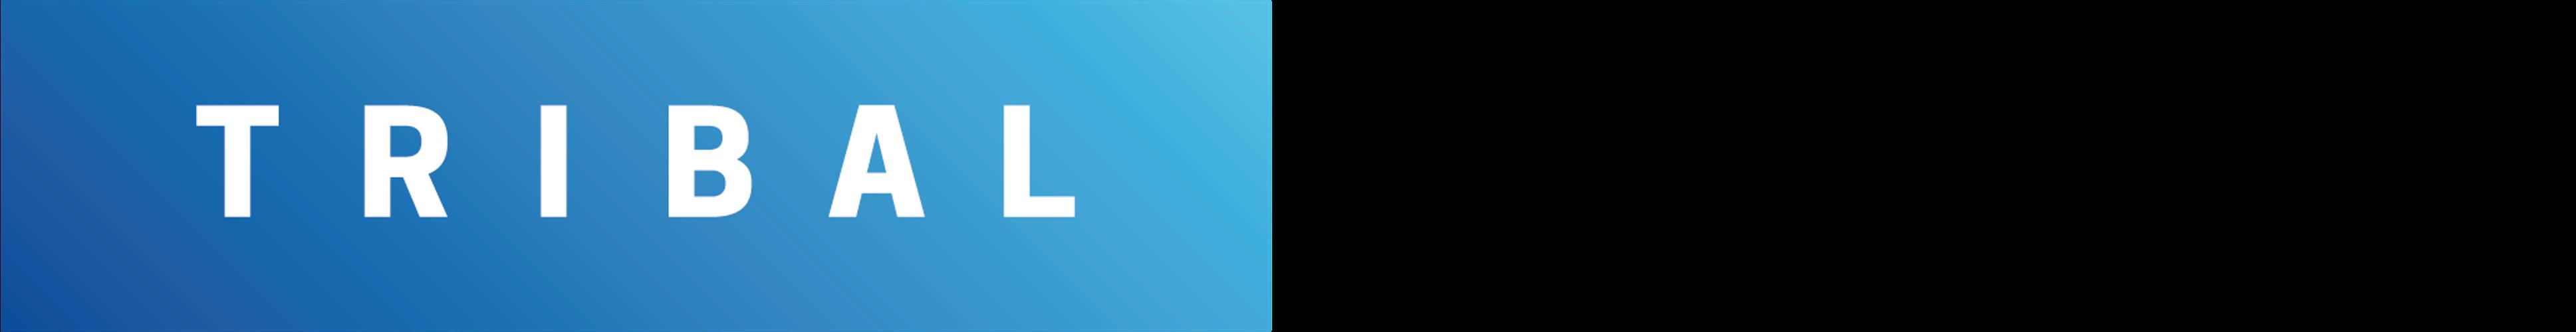 Tribaligraduate web header logo-1